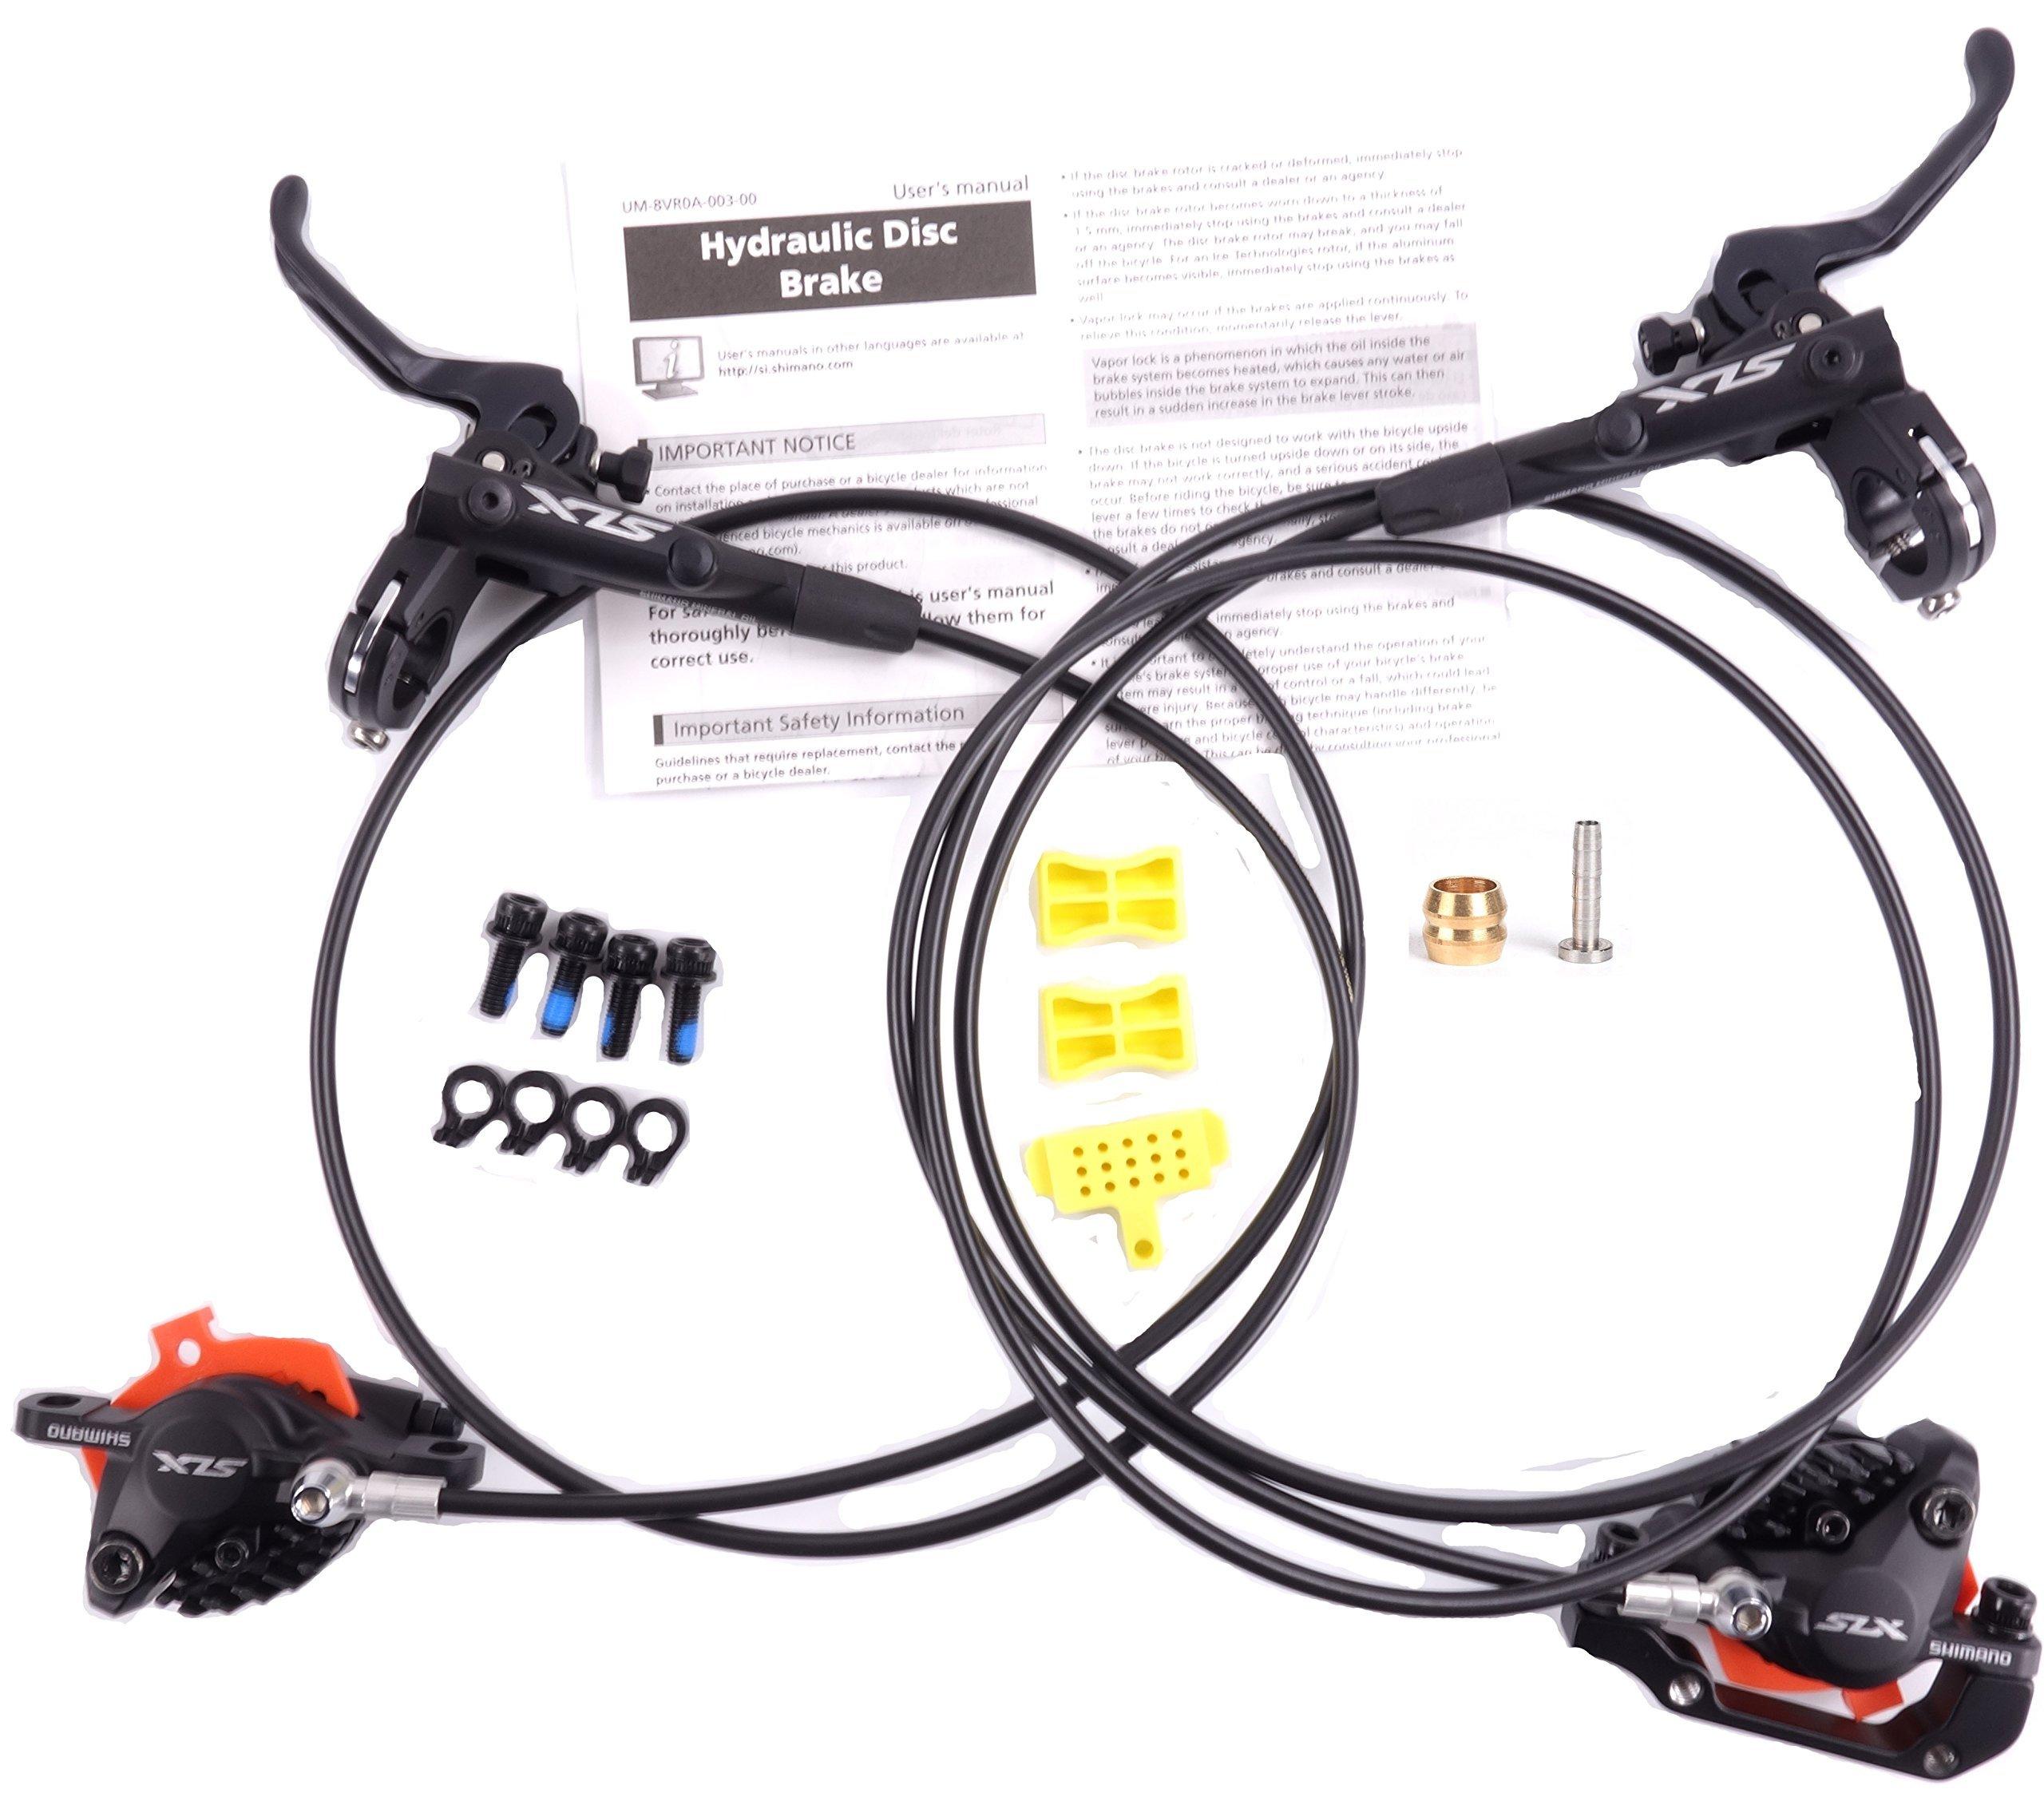 Shimano SLX M7000 Hydraulic Disk Brake MTB Front & Rear Set 1000mm/1600mm ice tech